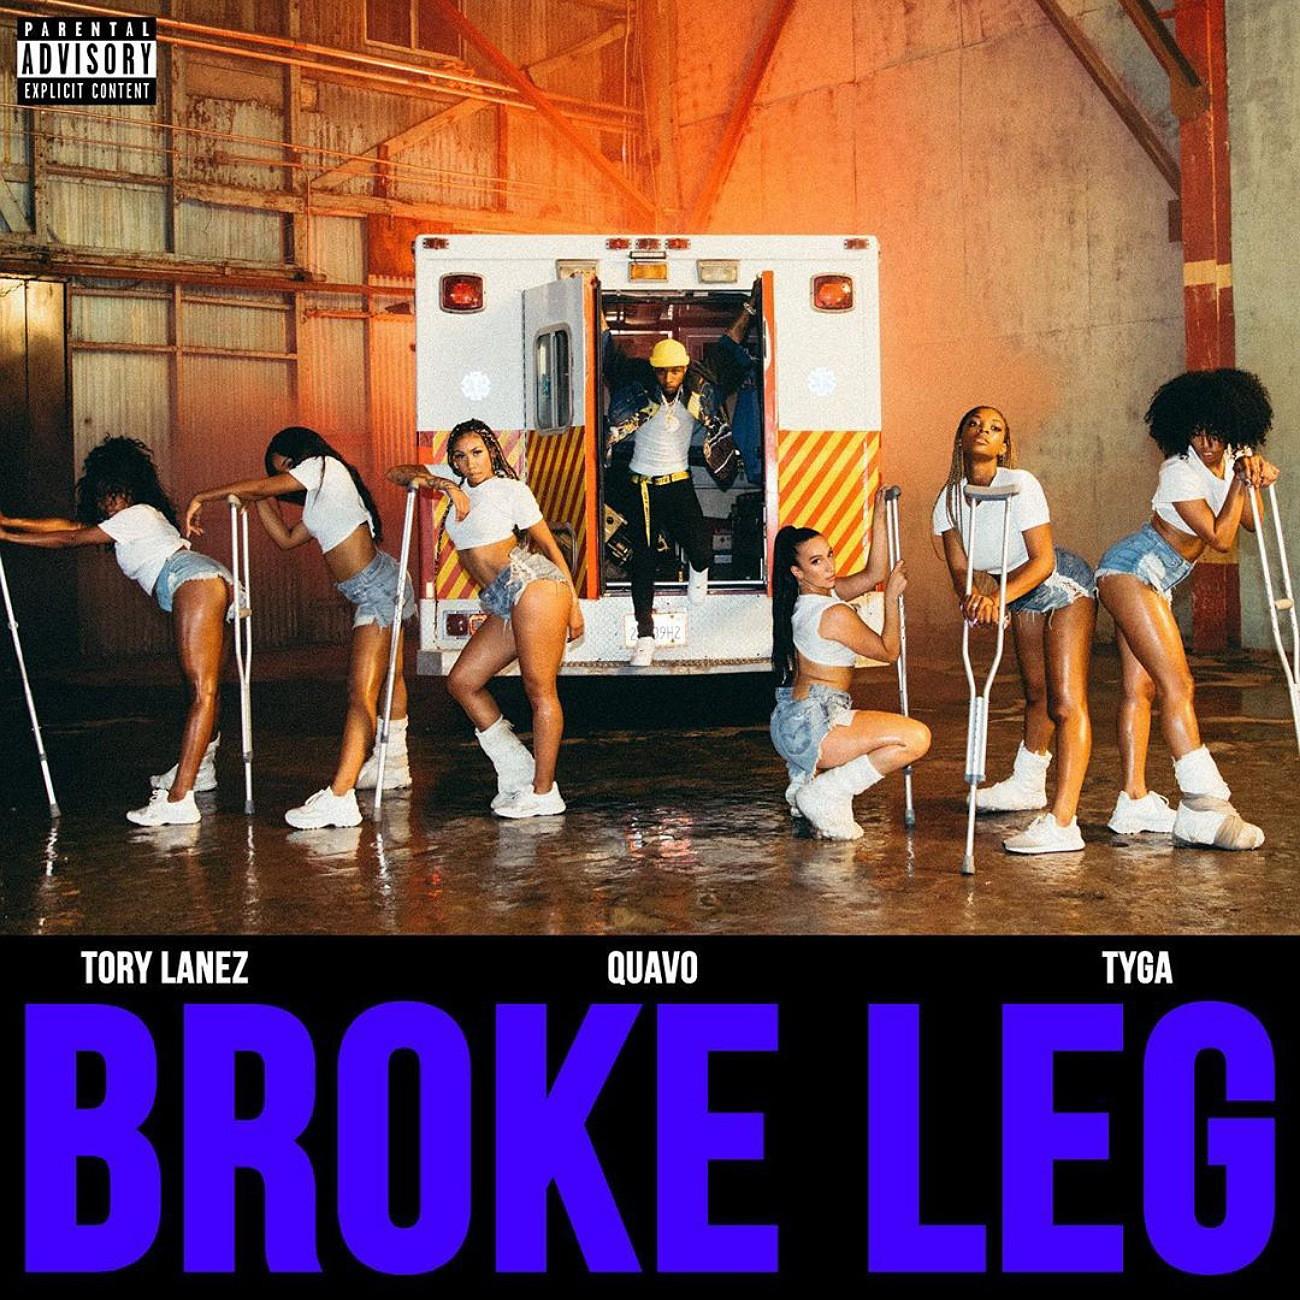 [INSTRUMENTAL] Tory Lanez – Broke Leg Ft Quavo x Tyga (Prod. by HitSound)